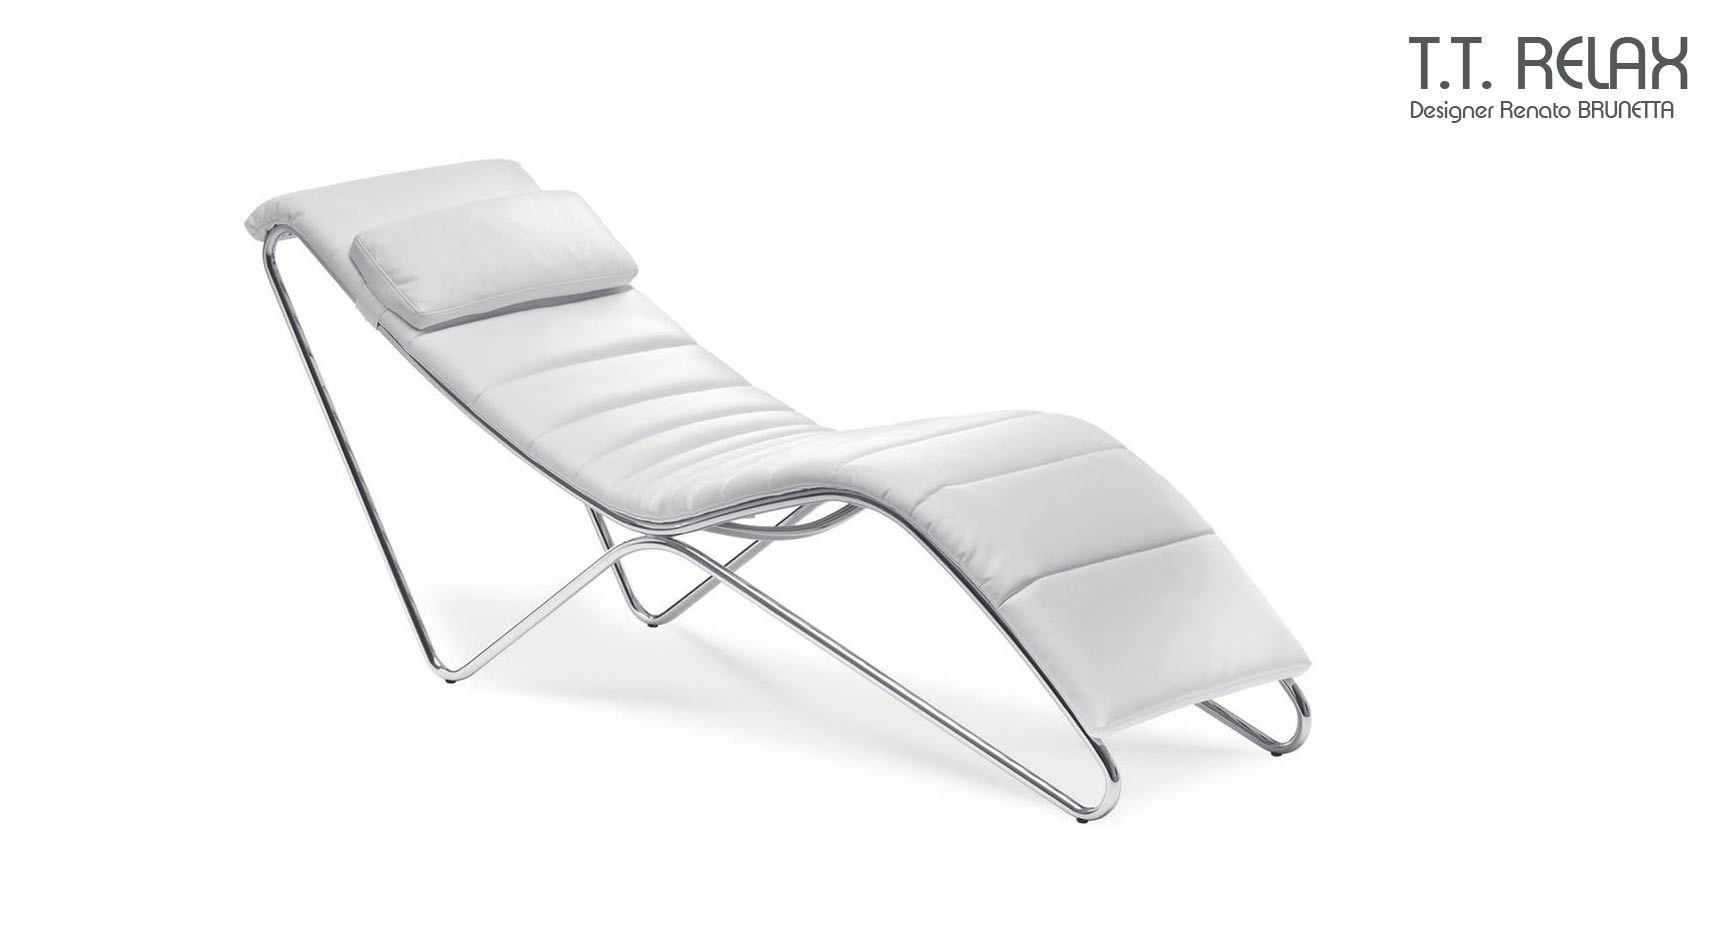 Fauteuil De Repos T T Relax Design Renato Brunetta Design Mobilier Design Fauteuil